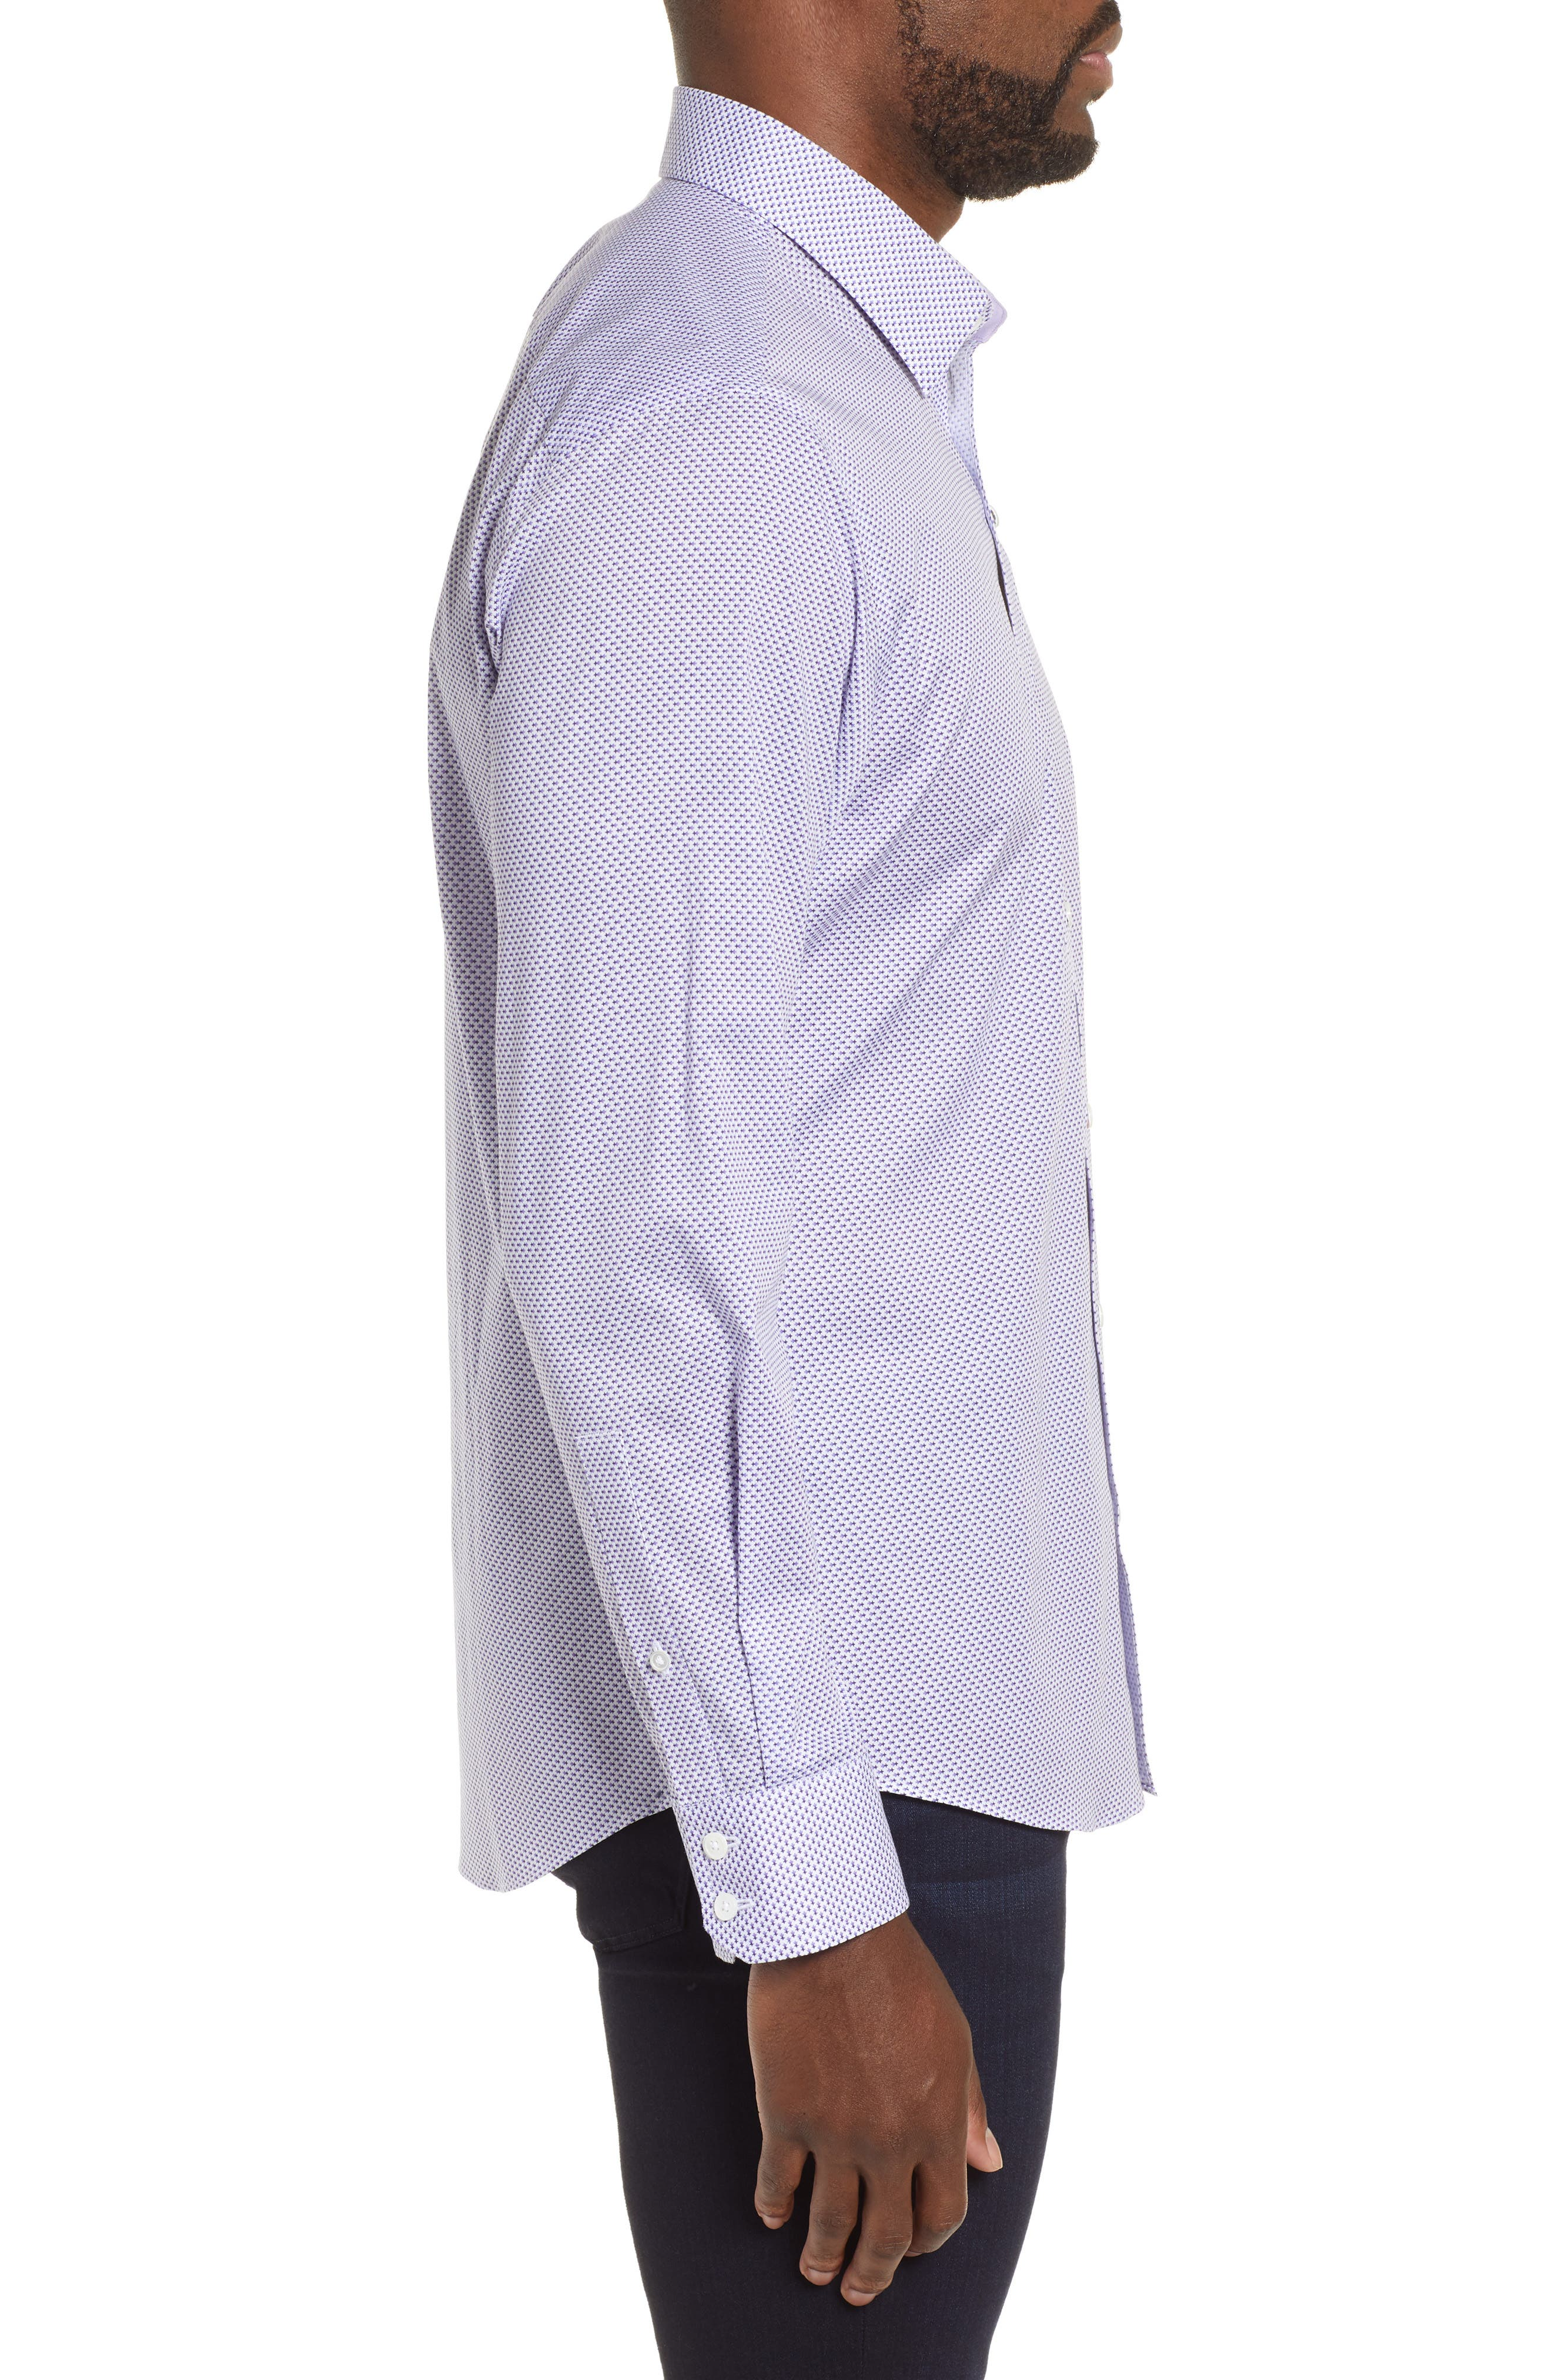 ZACHARY PRELL, Wilson Regular Fit Micro Print Sport Shirt, Alternate thumbnail 4, color, PURPLE